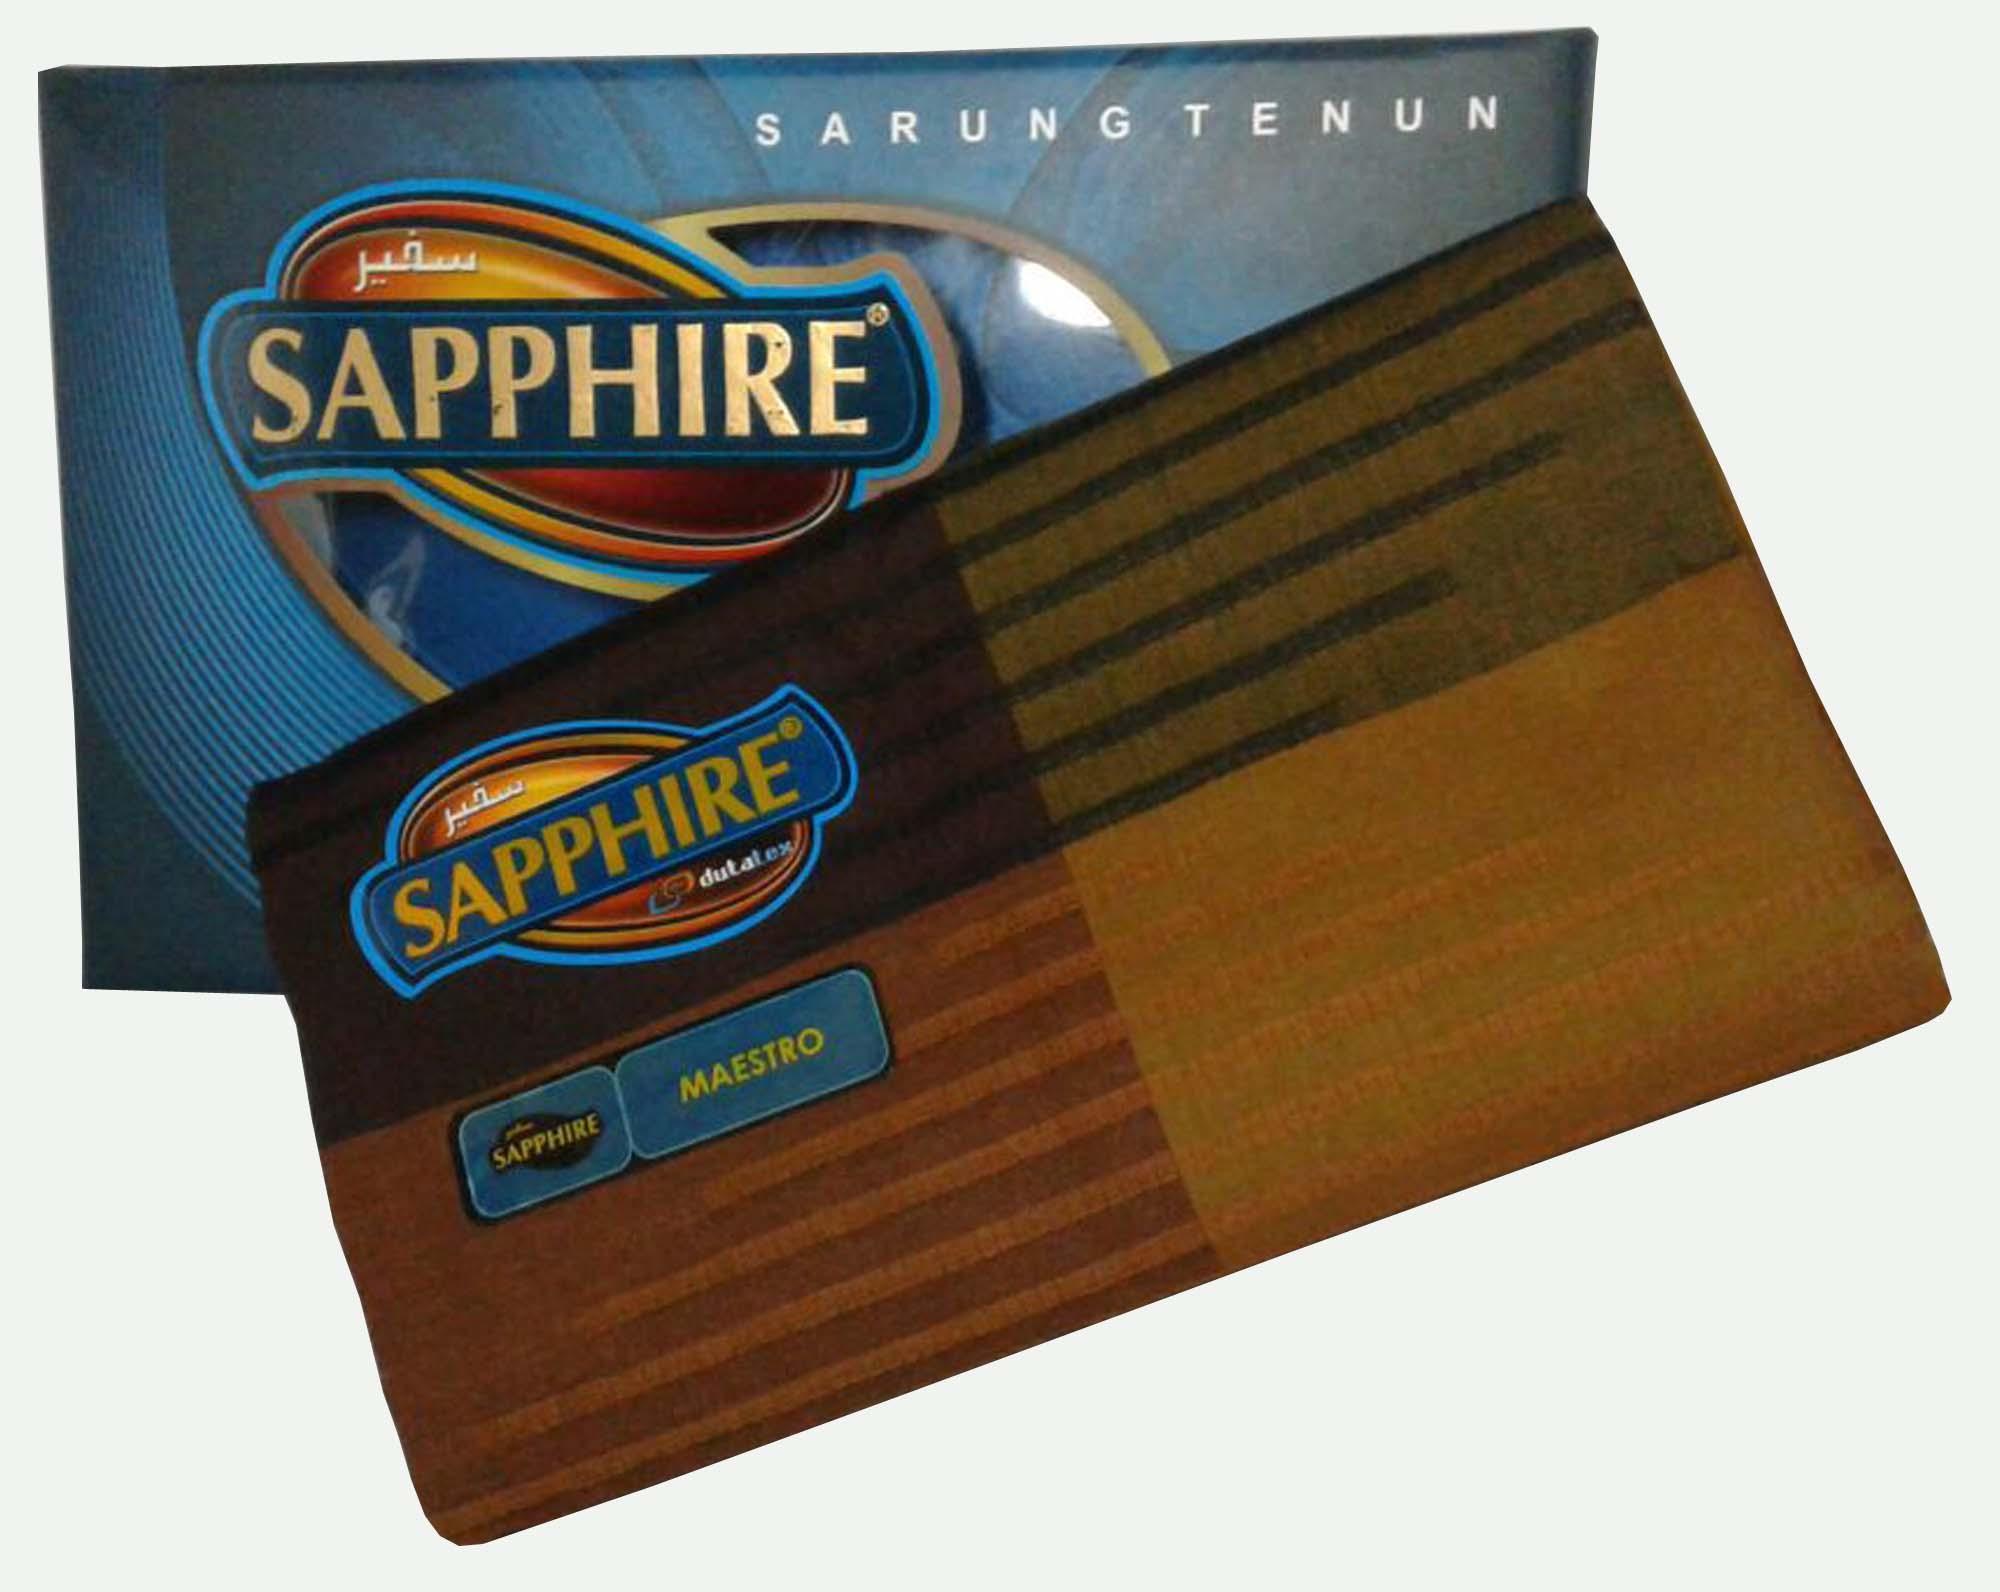 Diky Noval/ Sarung Pria/ Sarung Sapphire/ Sarung Tenun/ Sarung 100% Indonesia/ Motif Maestro